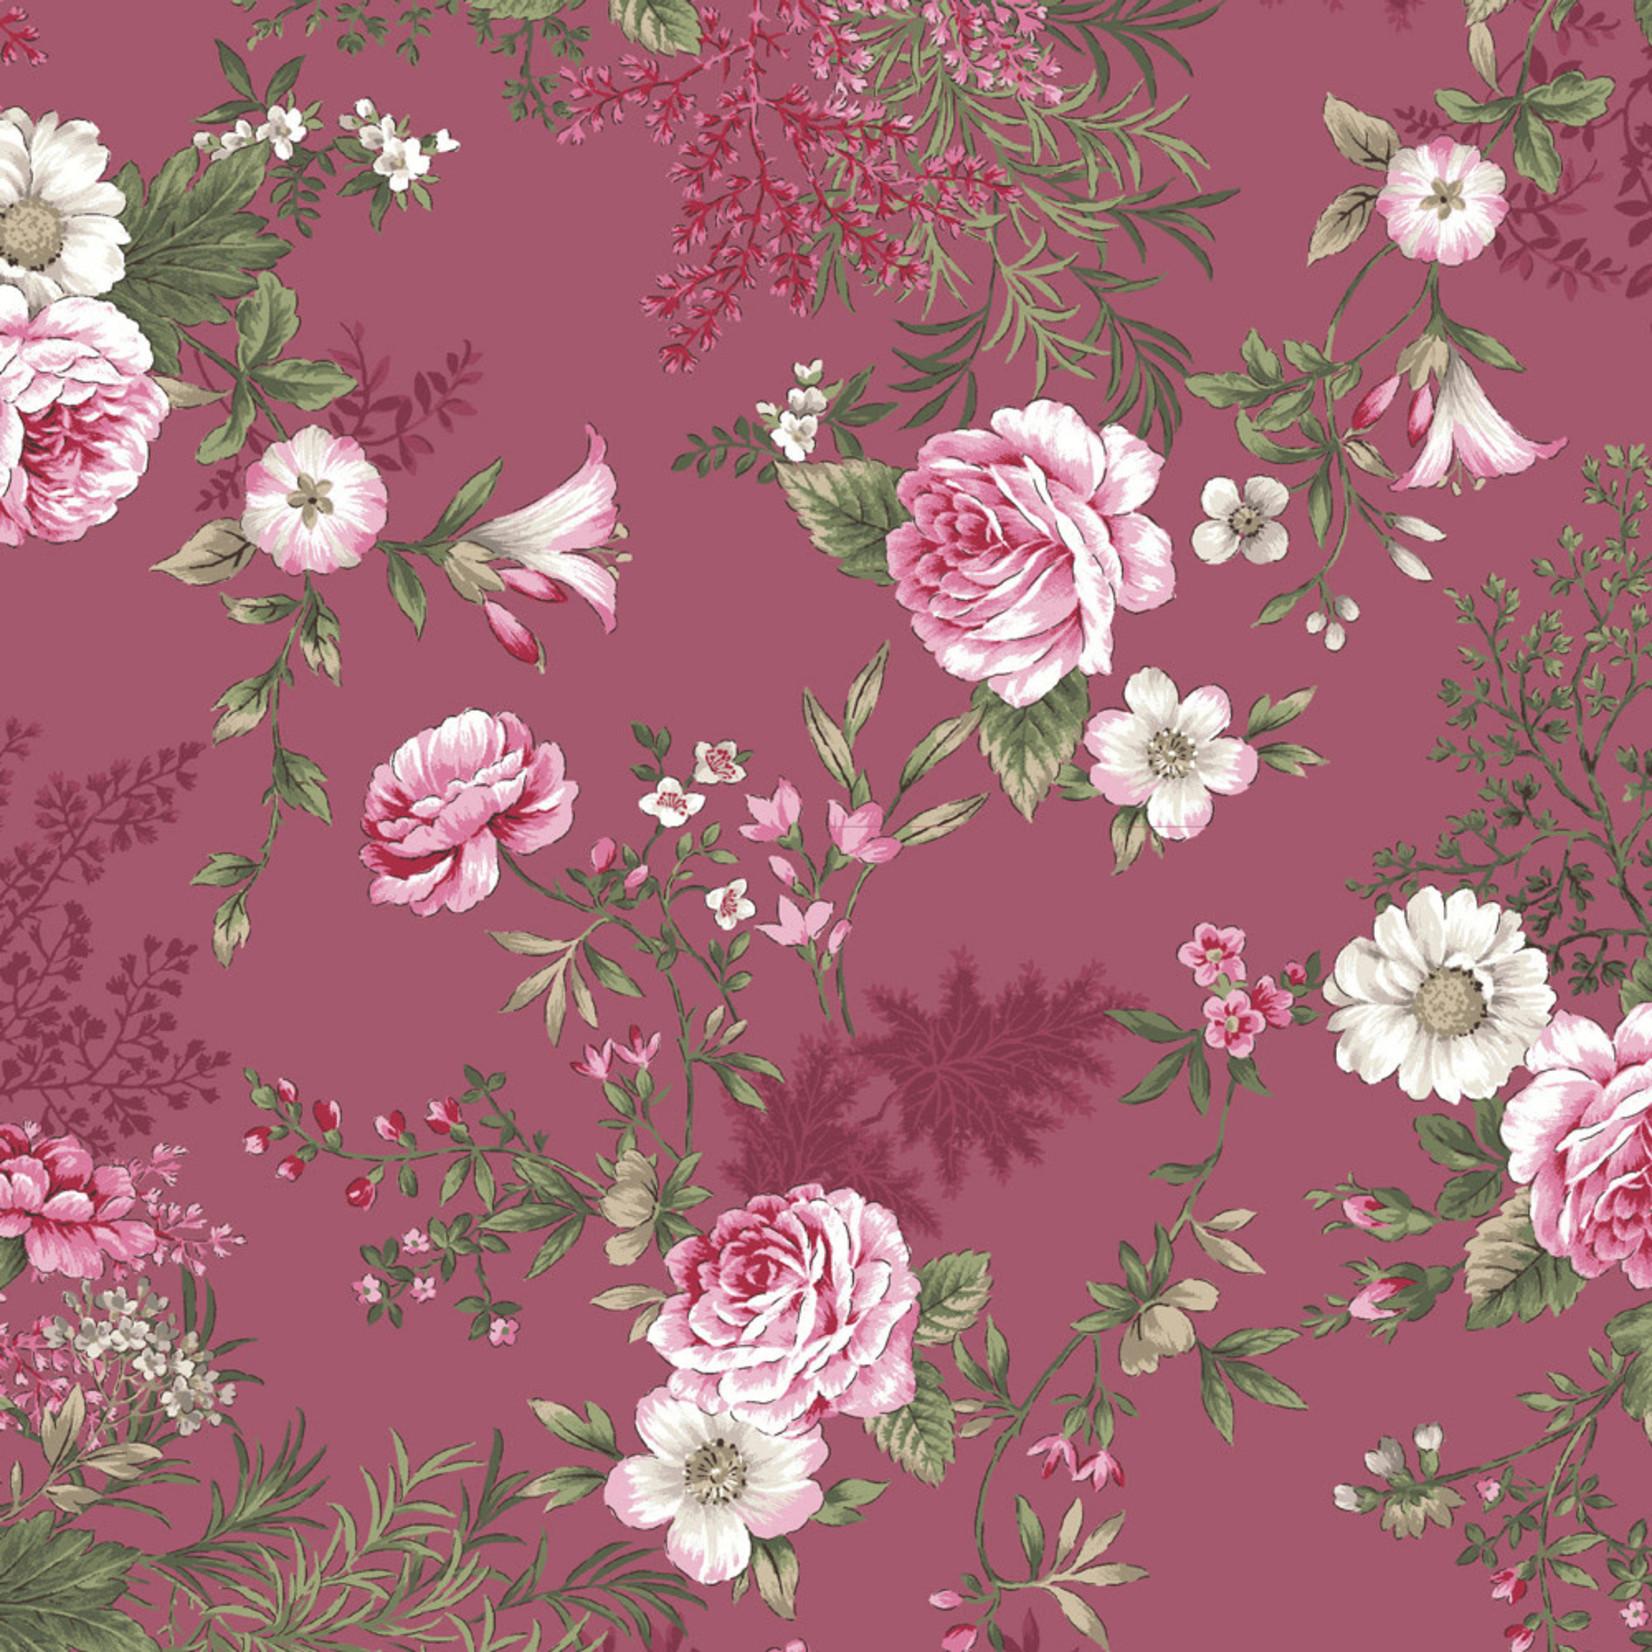 Stoffabrics Juliet Roses - Roses - Pink